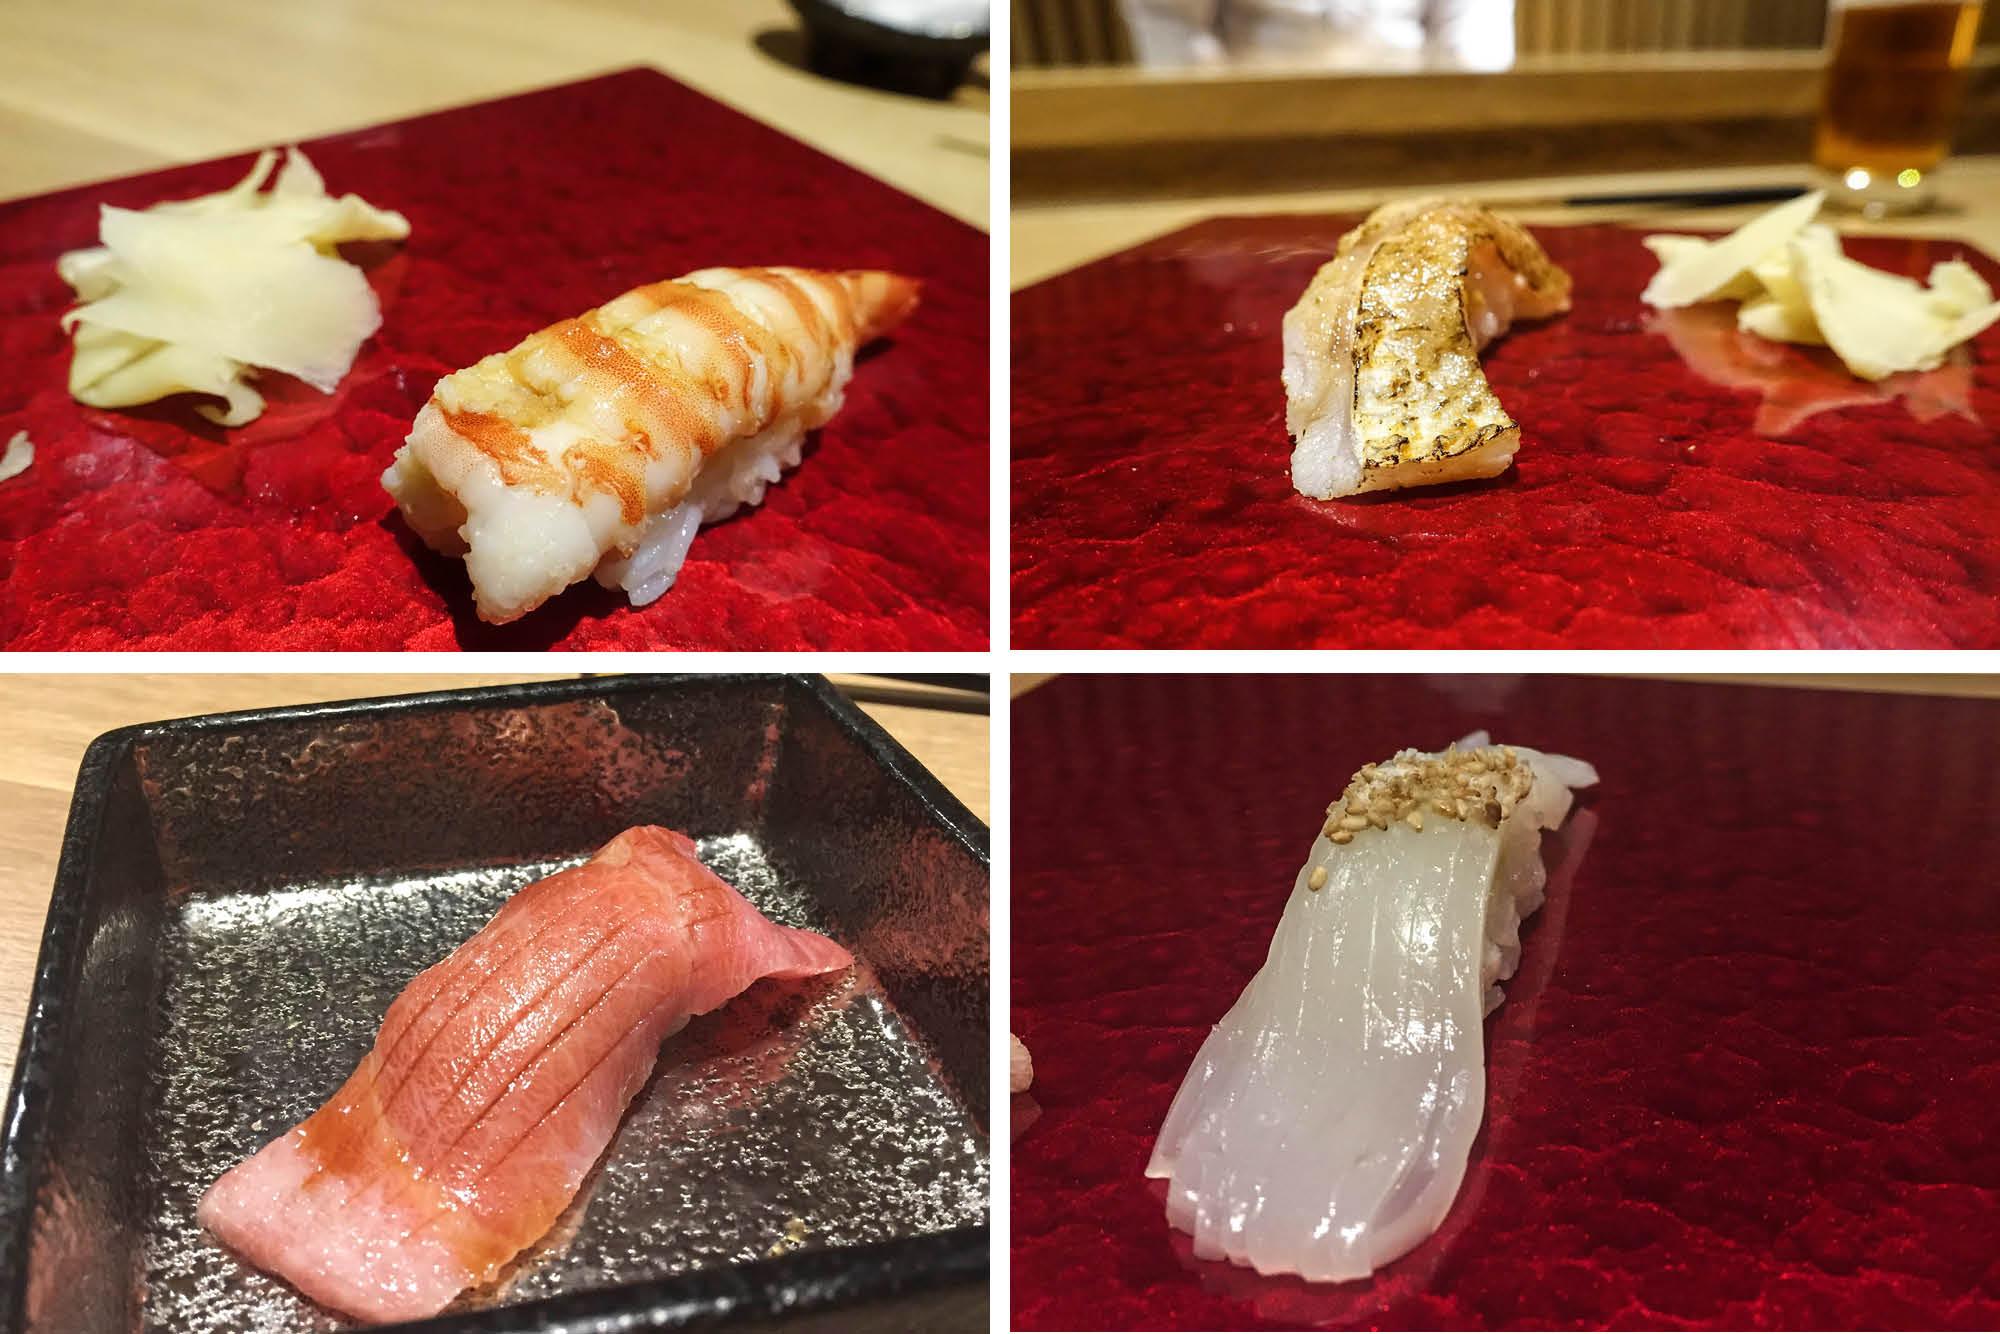 The High-Class Sushi Bar Has a New Secret Weapon